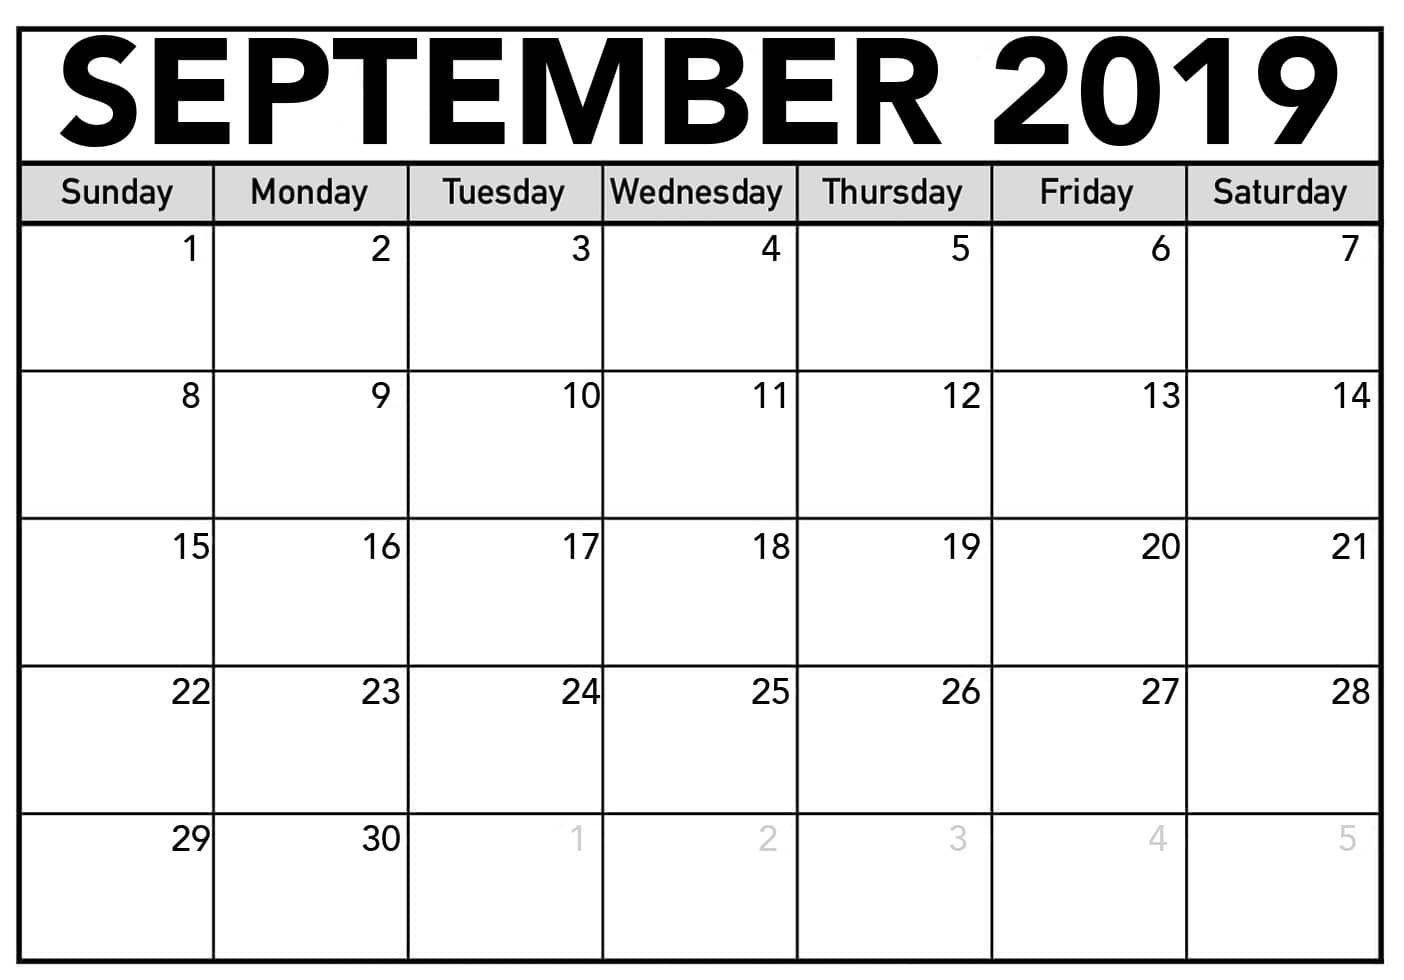 Free Printable September 2019 Calendar Free Download-Blank Printable Catholic Calender September